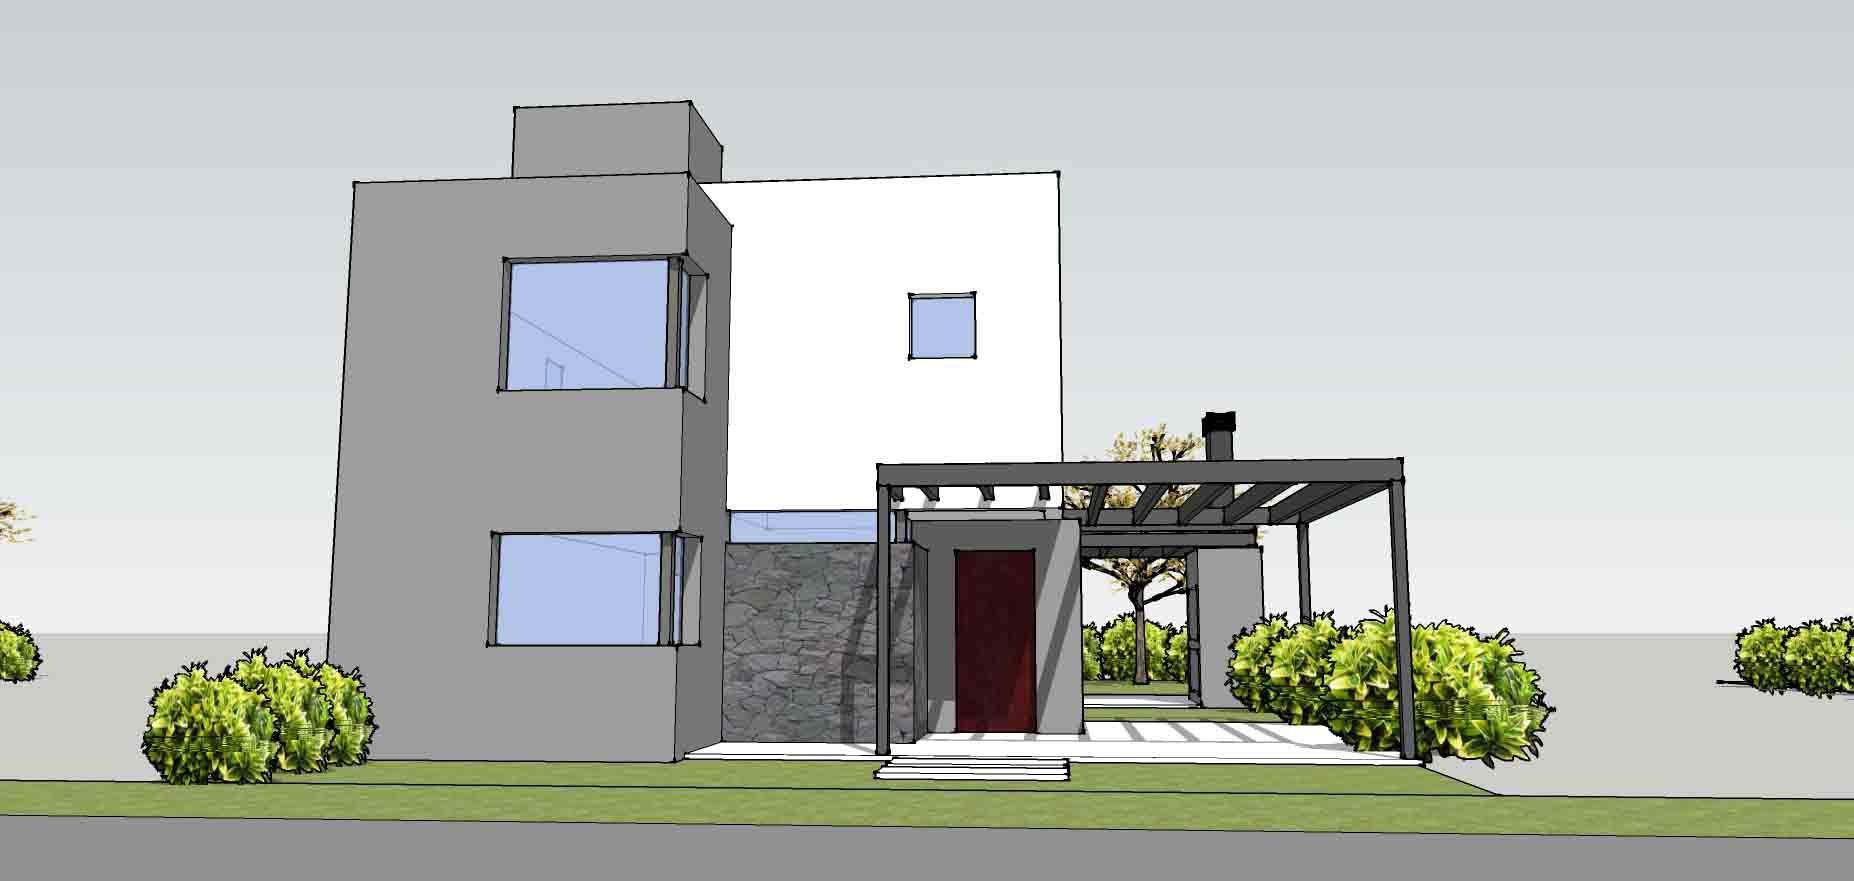 country #house #design #architecture #SZA #white #gray | CASAS DE ...